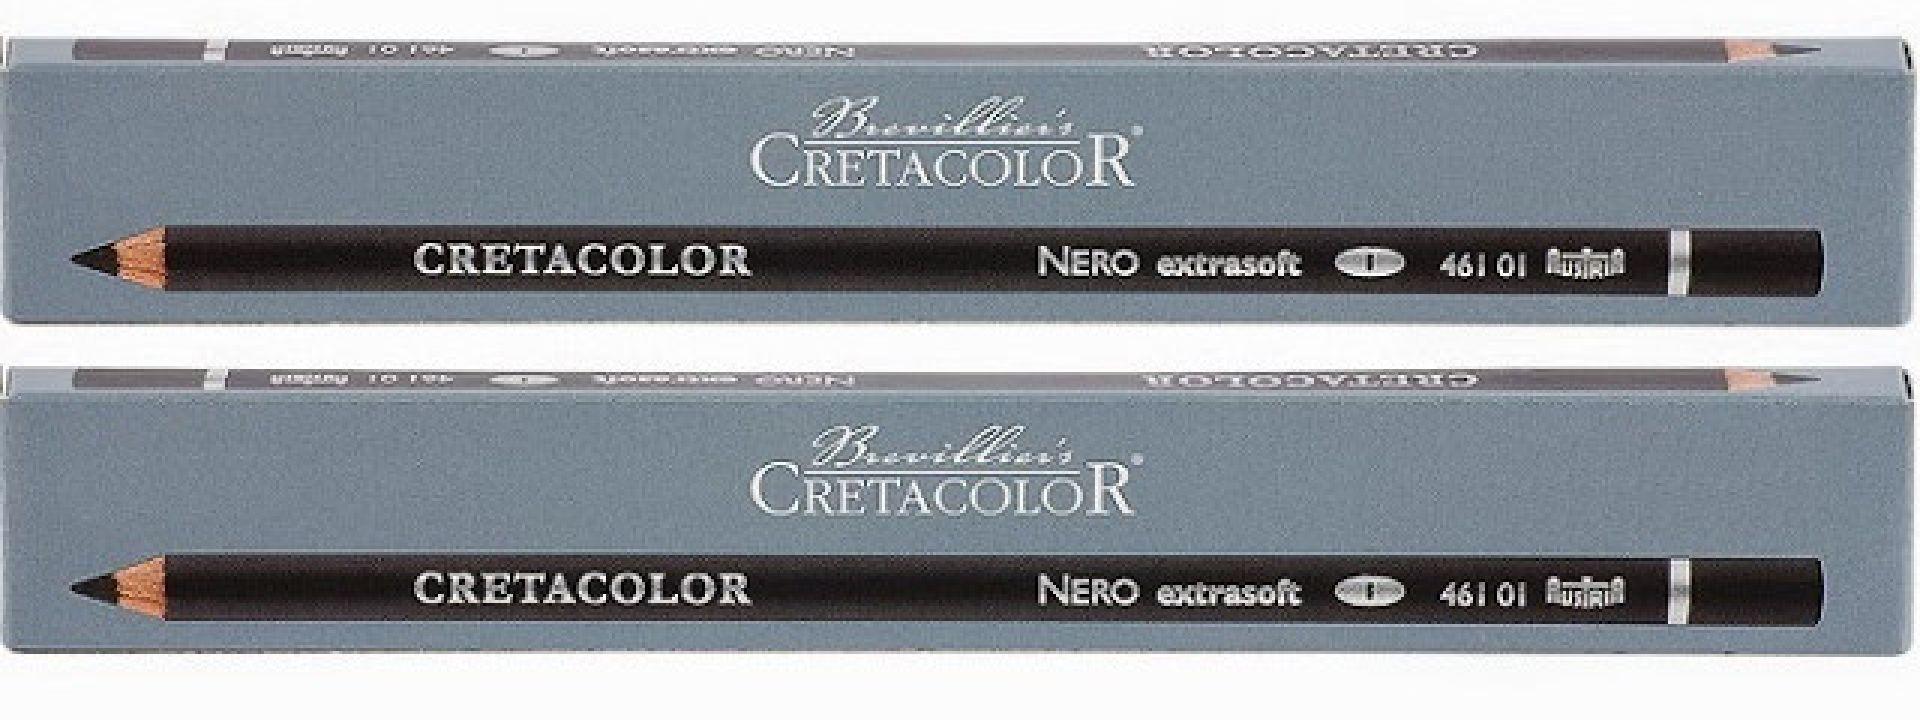 cretacolor-46101-original-imadrhzfxd7gufsa.jpeg?q=80